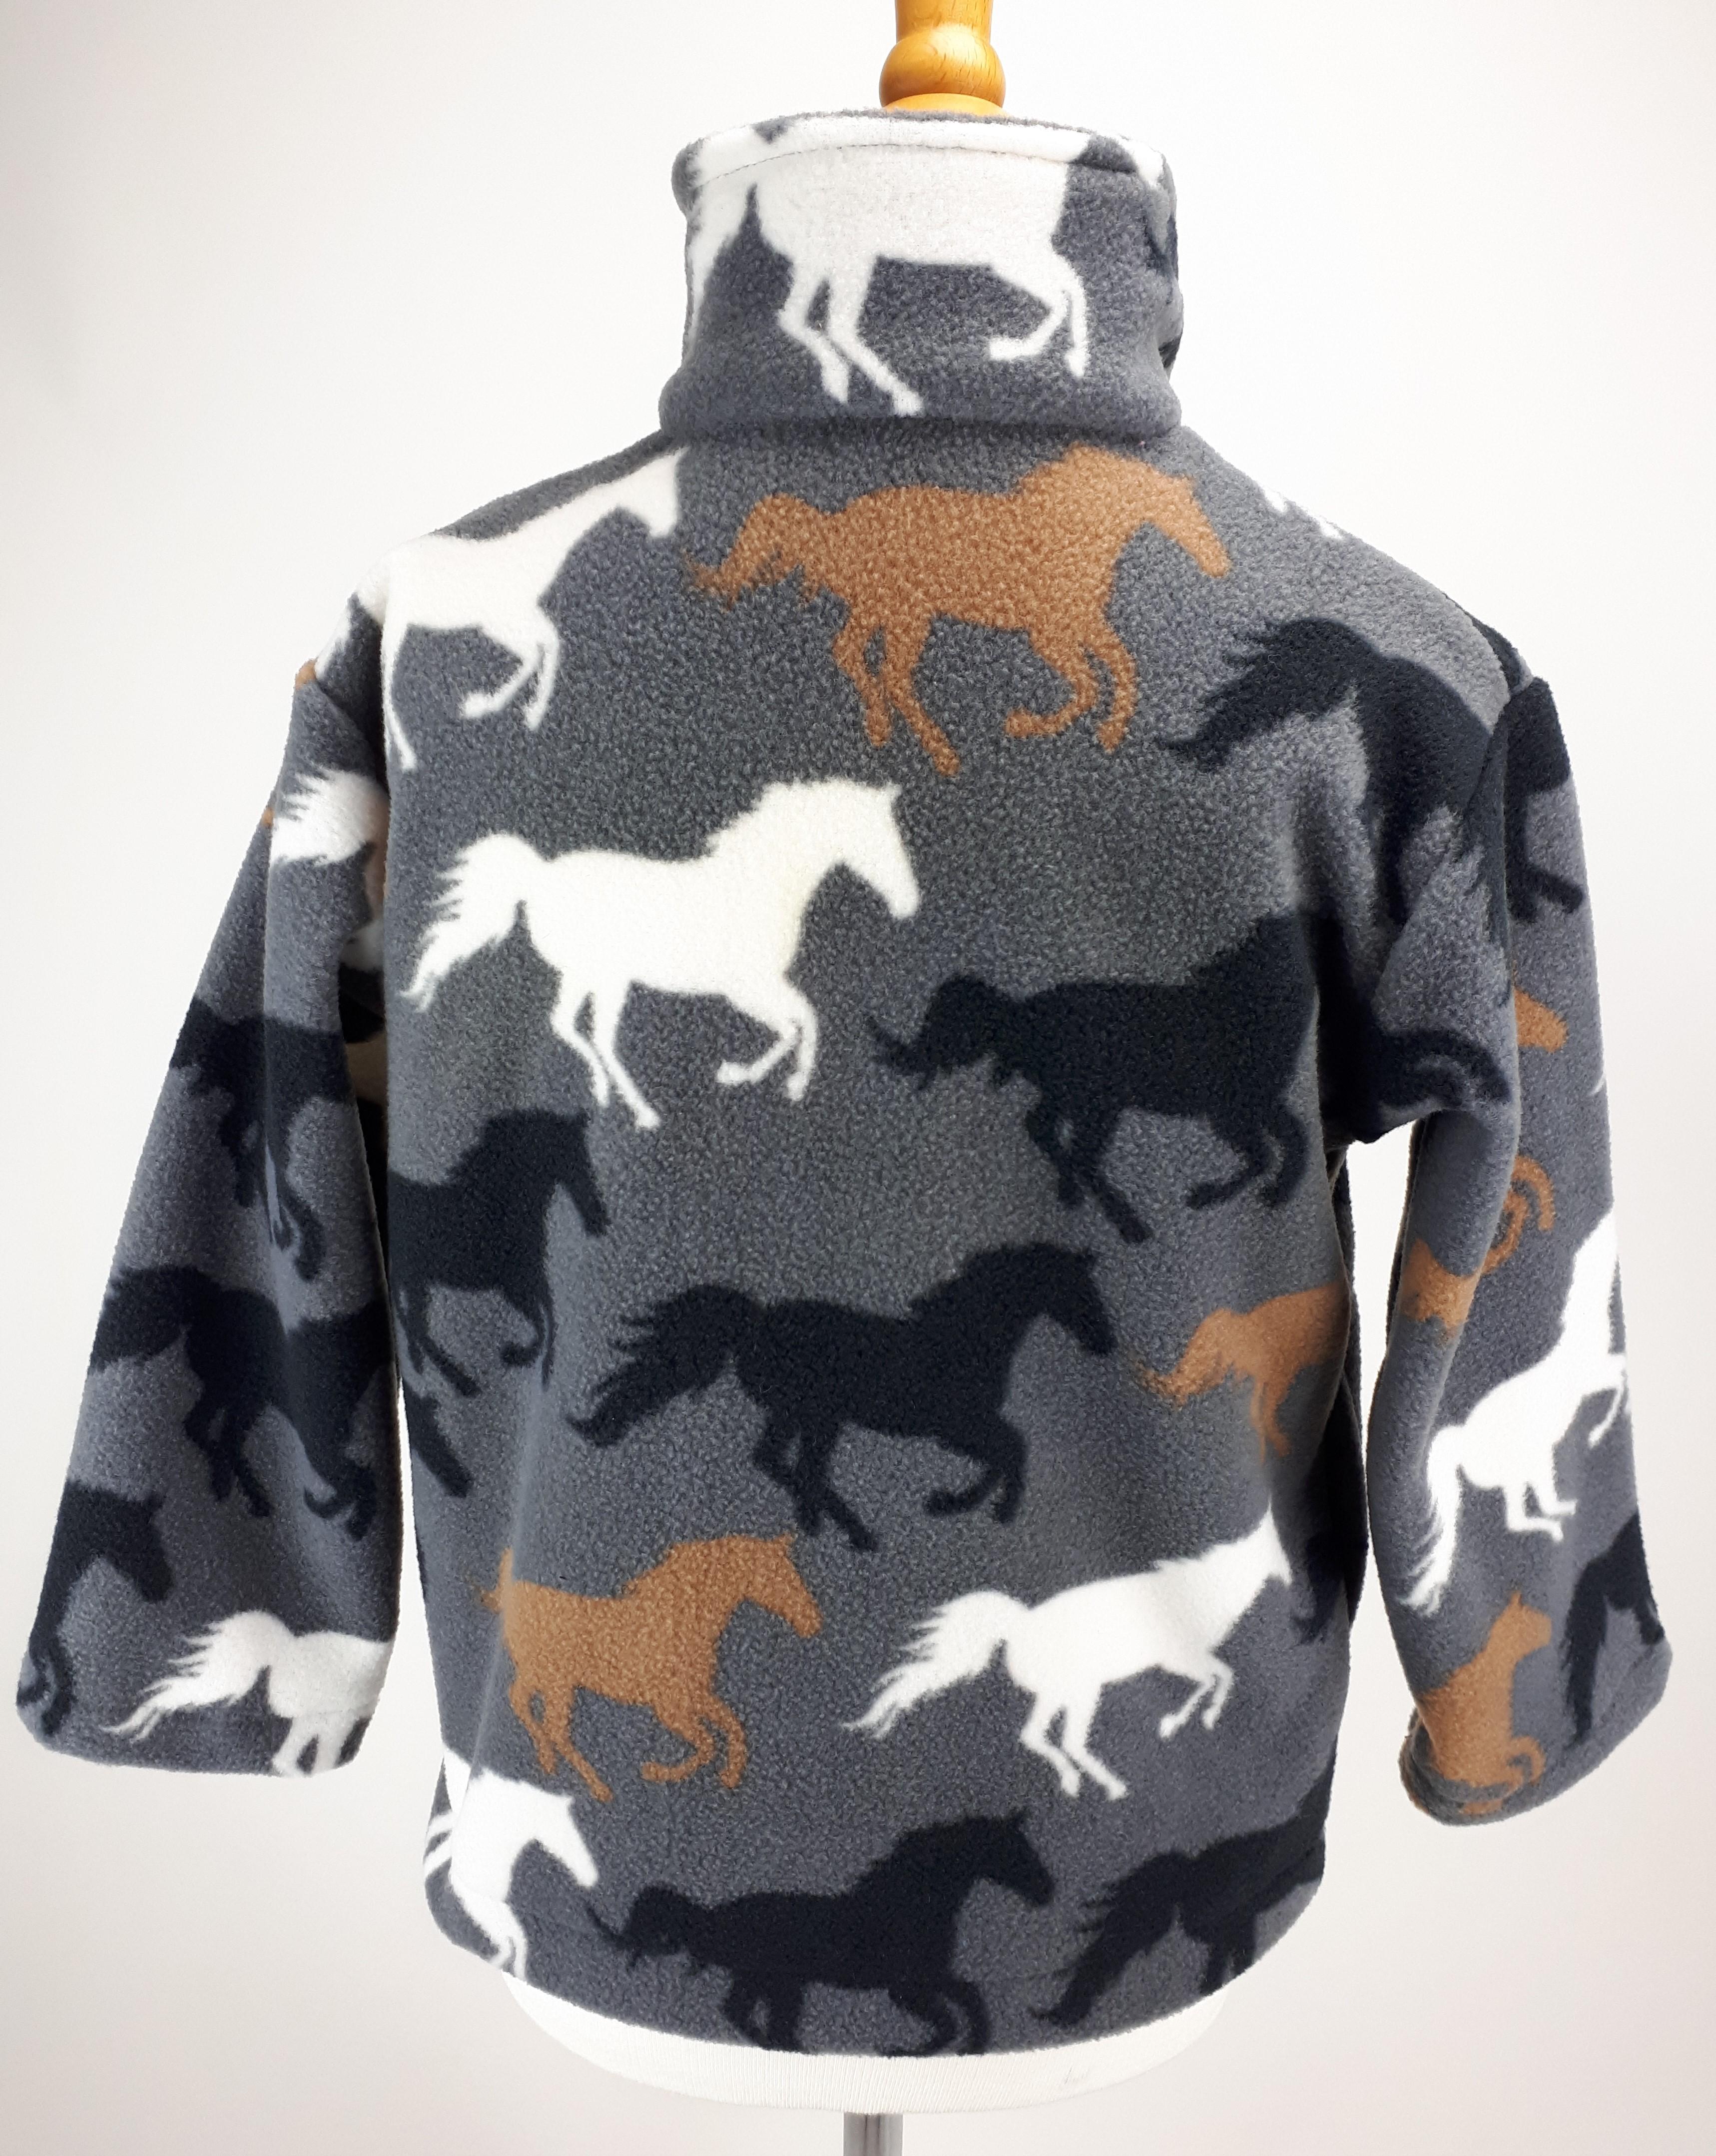 Silver Horses Jacket